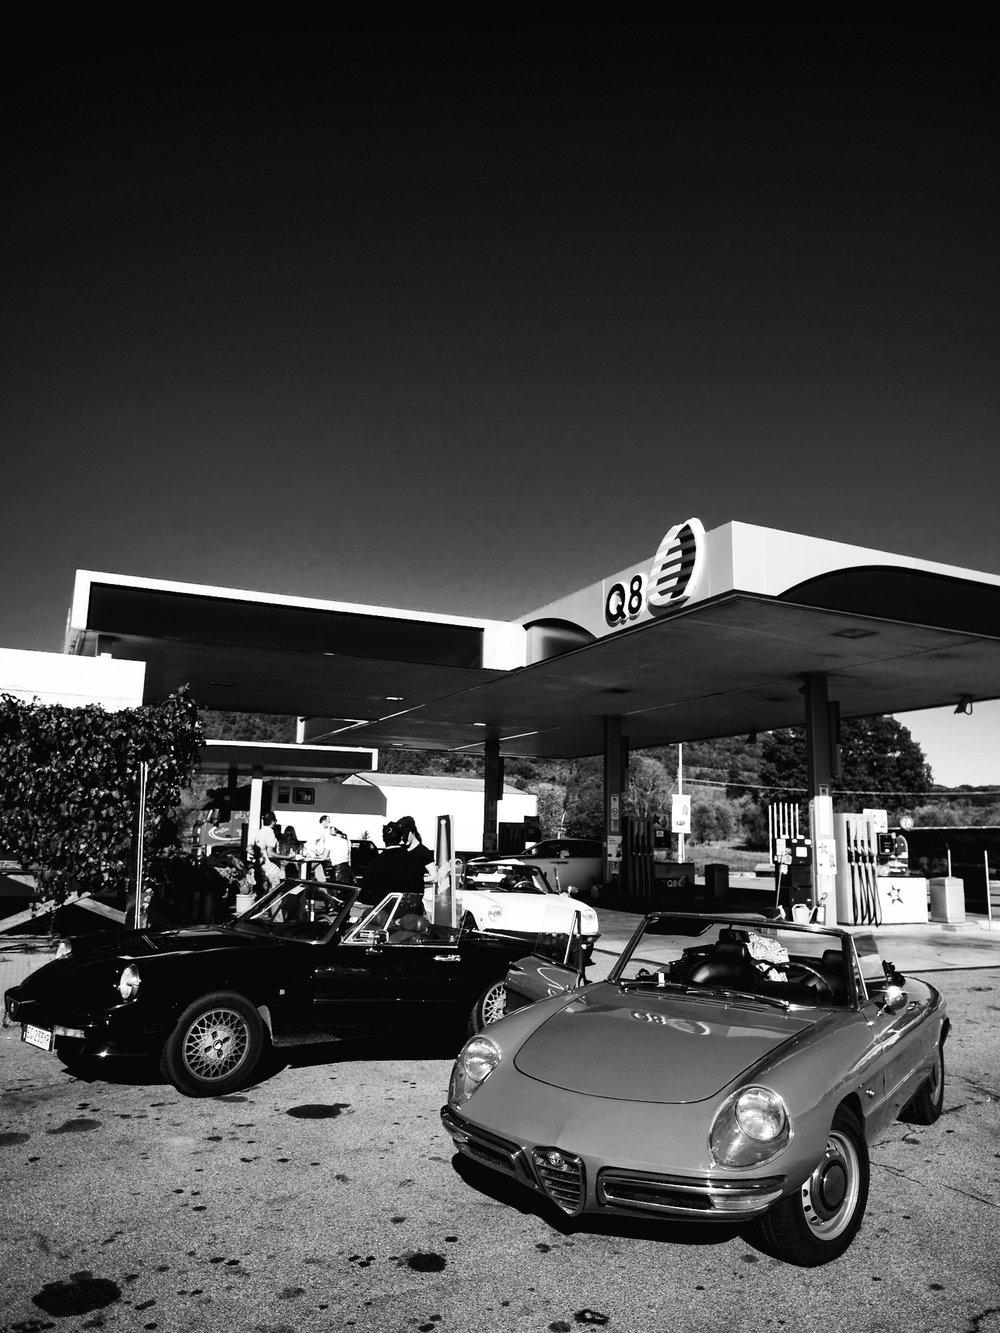 Olympus PEN 12mm f/2.0 Lens Wide Angle Road Trip Italy Alfa Romeo Vintage Italian Sports Cars Car Sportscar Sportscars Q8 Petrol Station